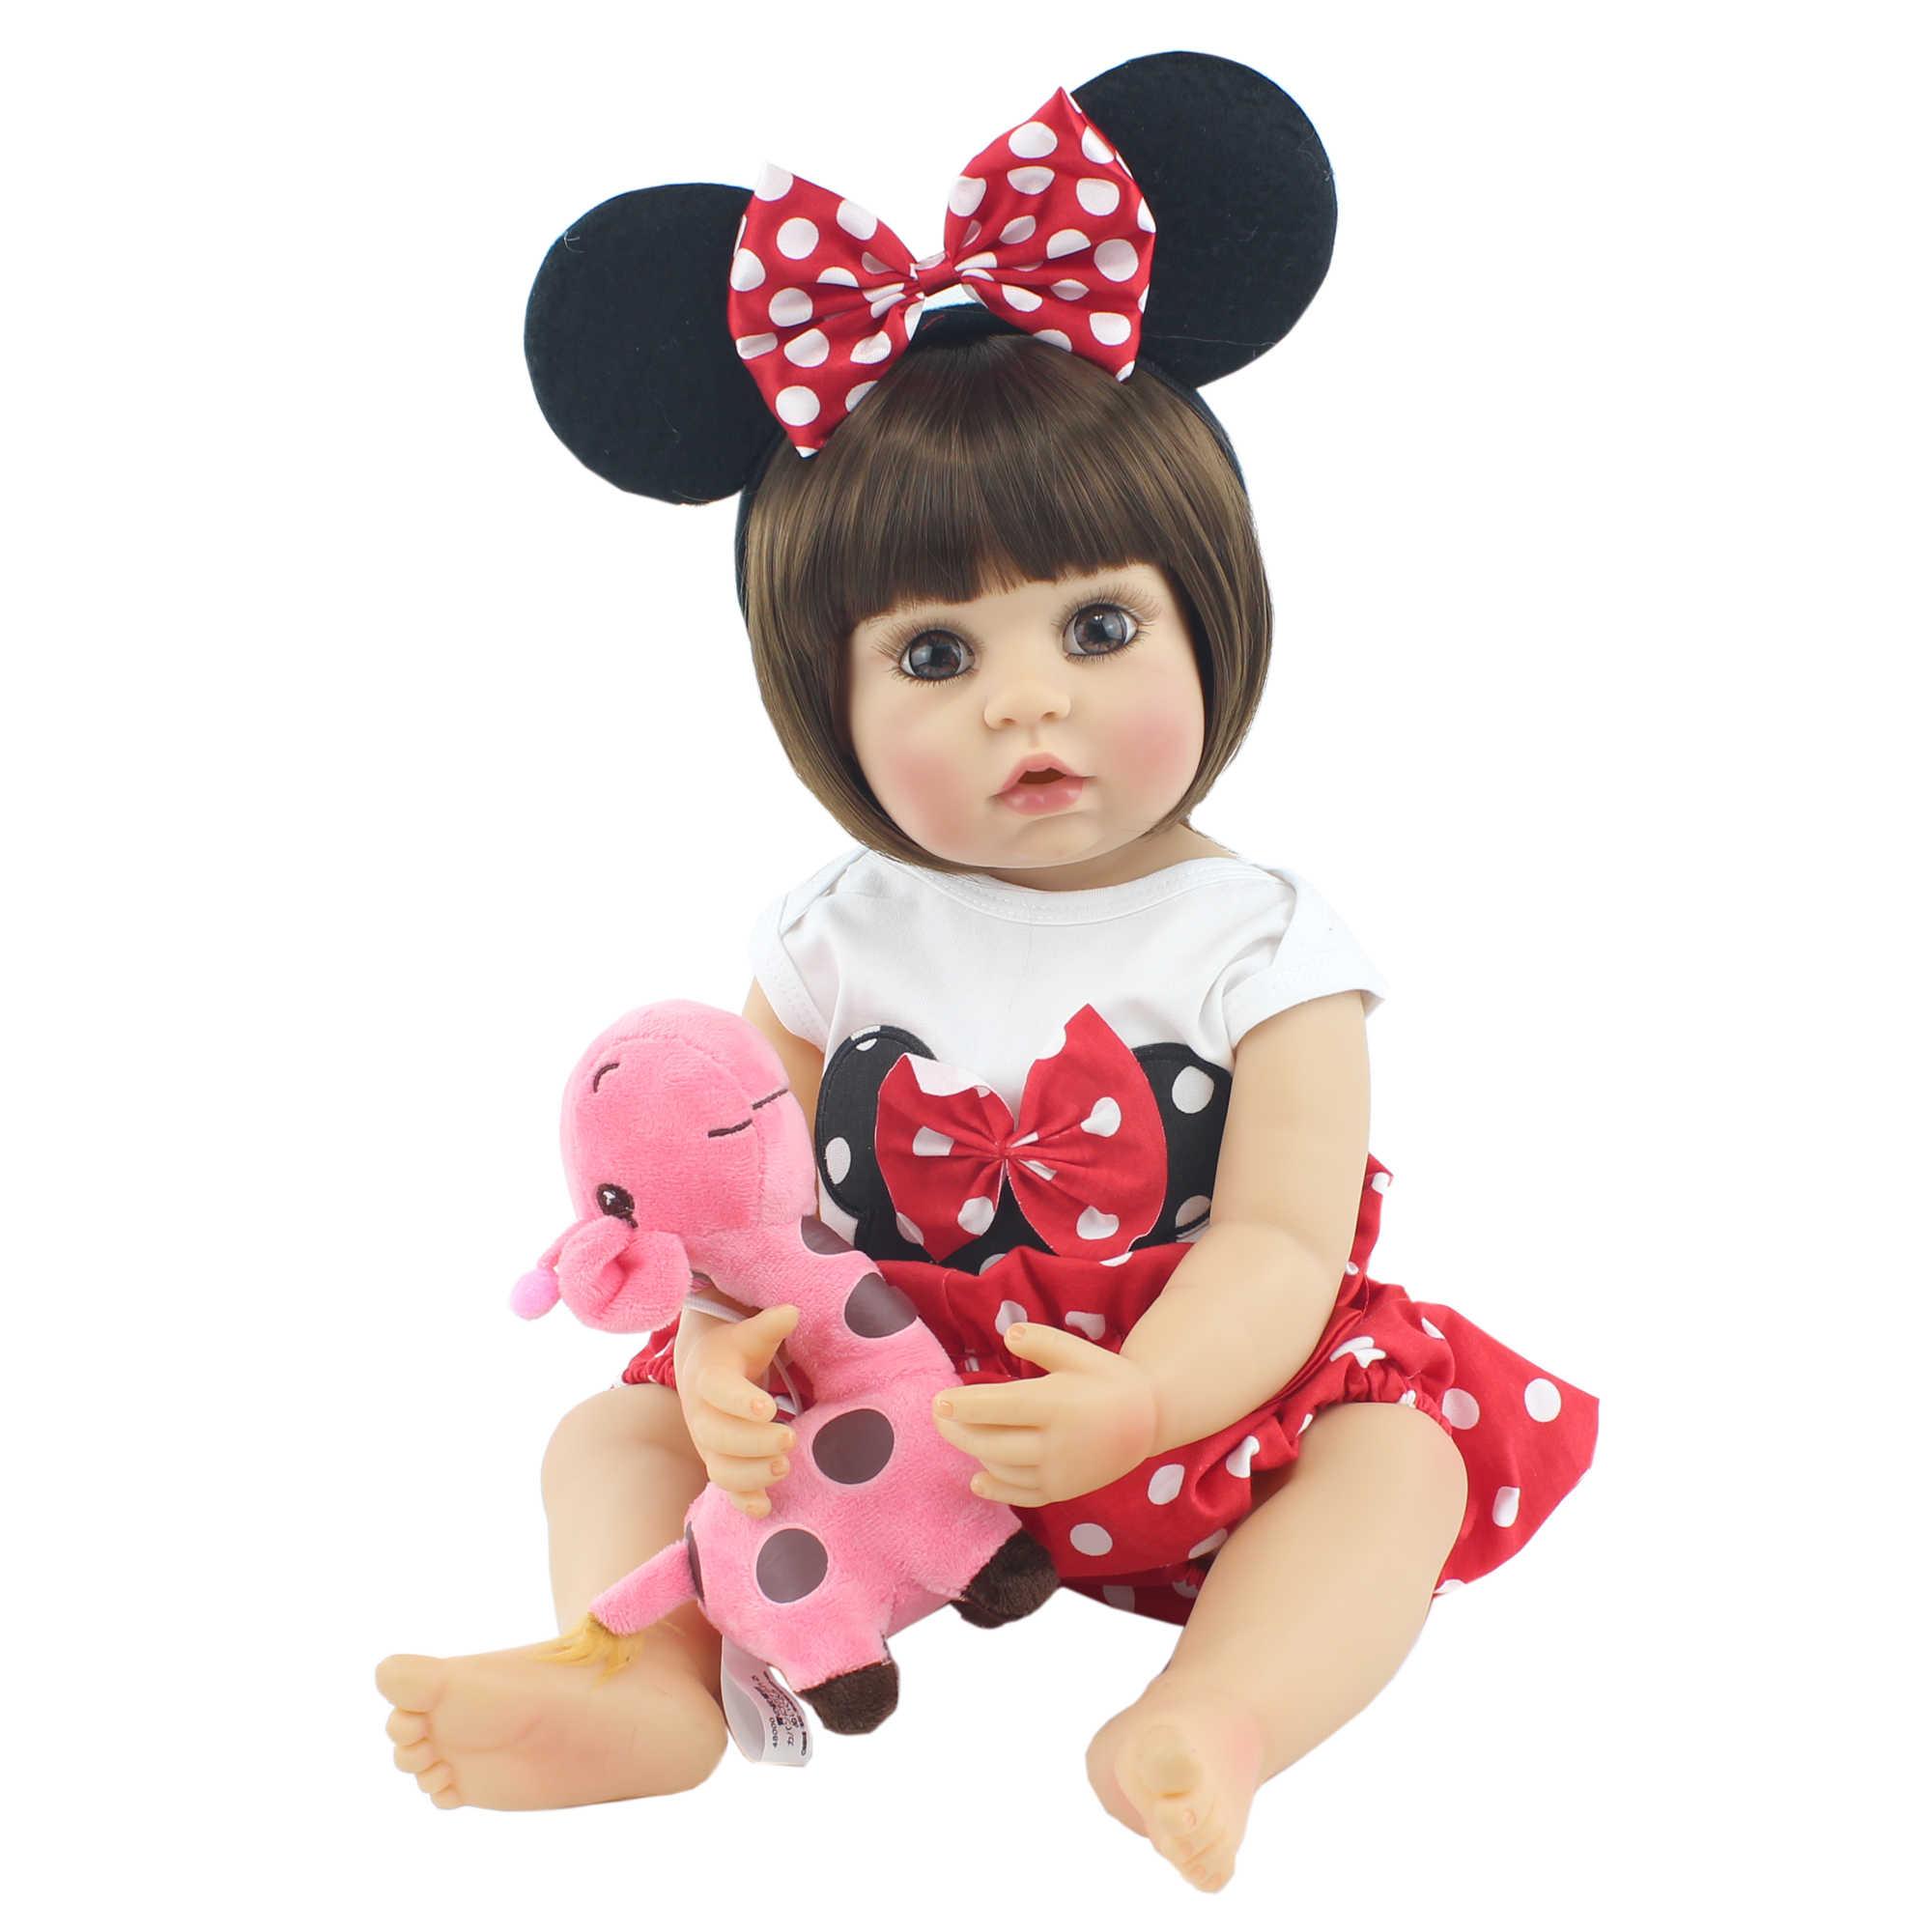 Bzdoll 55Cm Full Body Zachte Siliconen Reborn Baby Pop Speelgoed Levensechte Vinyl Levend Baby Dress Up Prinses Meisje Boneca verjaardagscadeau